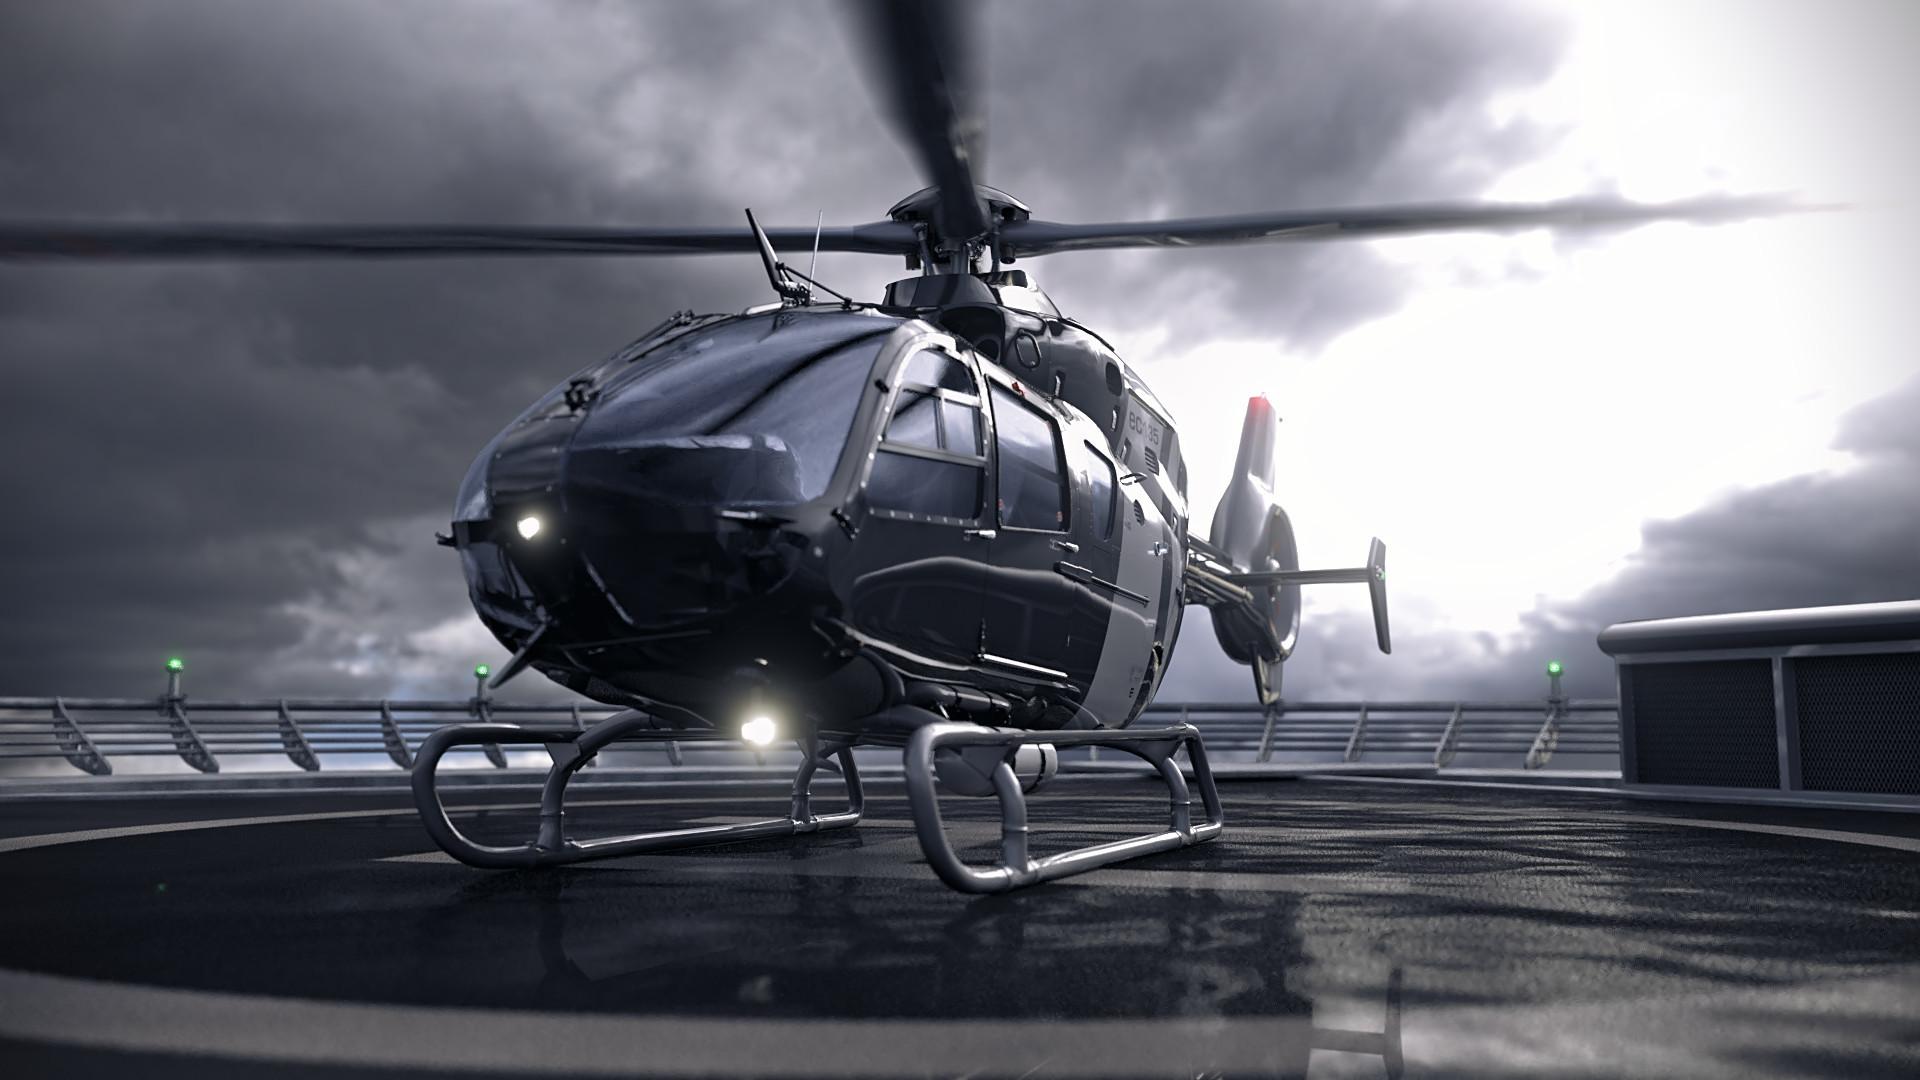 monteillard-damien-scene-heliport-helicoptere-ec135-11-01